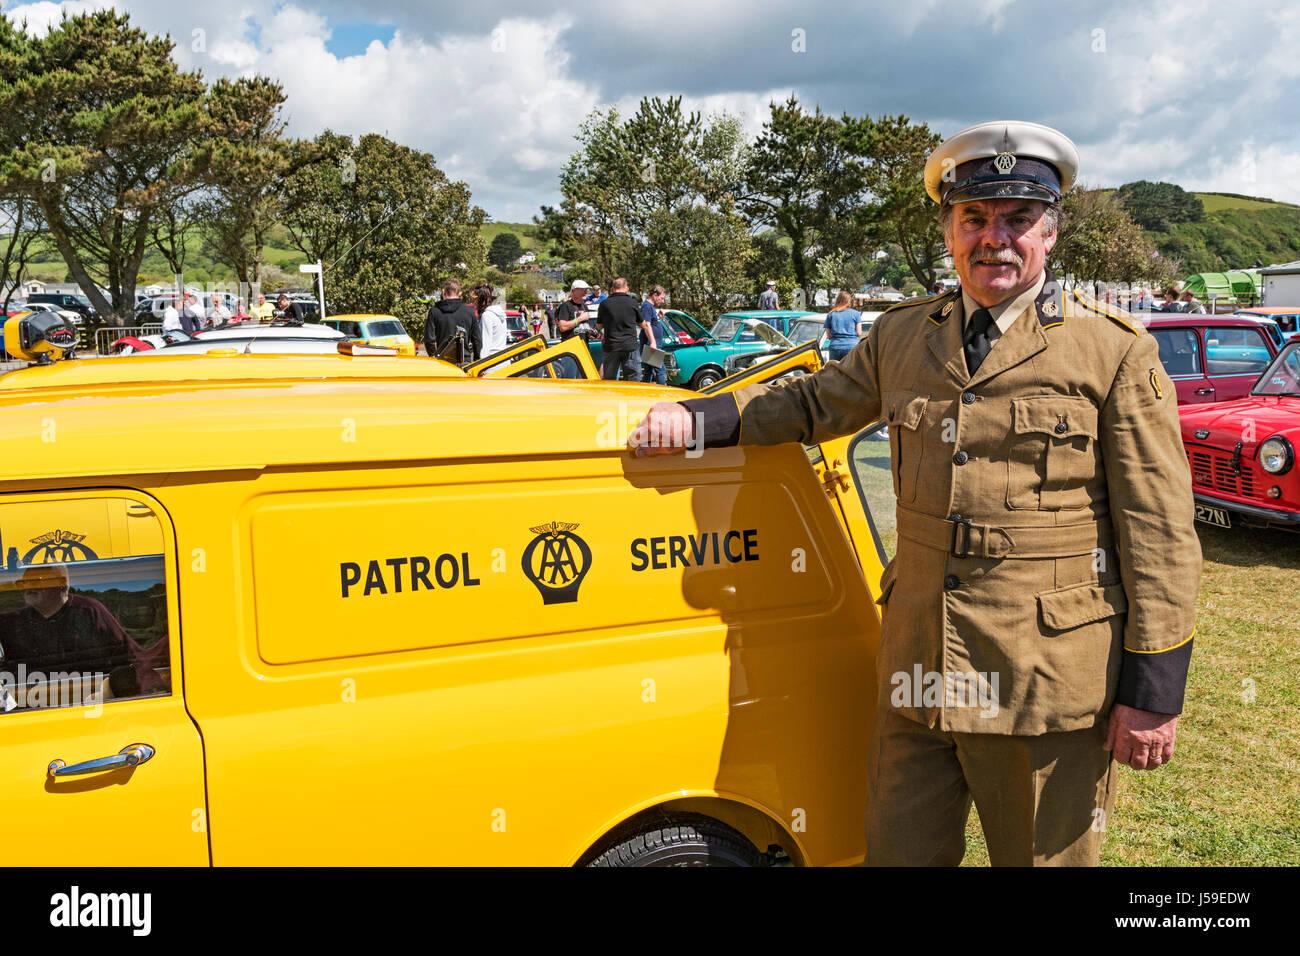 a 1960's AA patrol man and a patrol service mini van, at he cornish min car club show at pentewan in cornwall, uk. Stock Photo